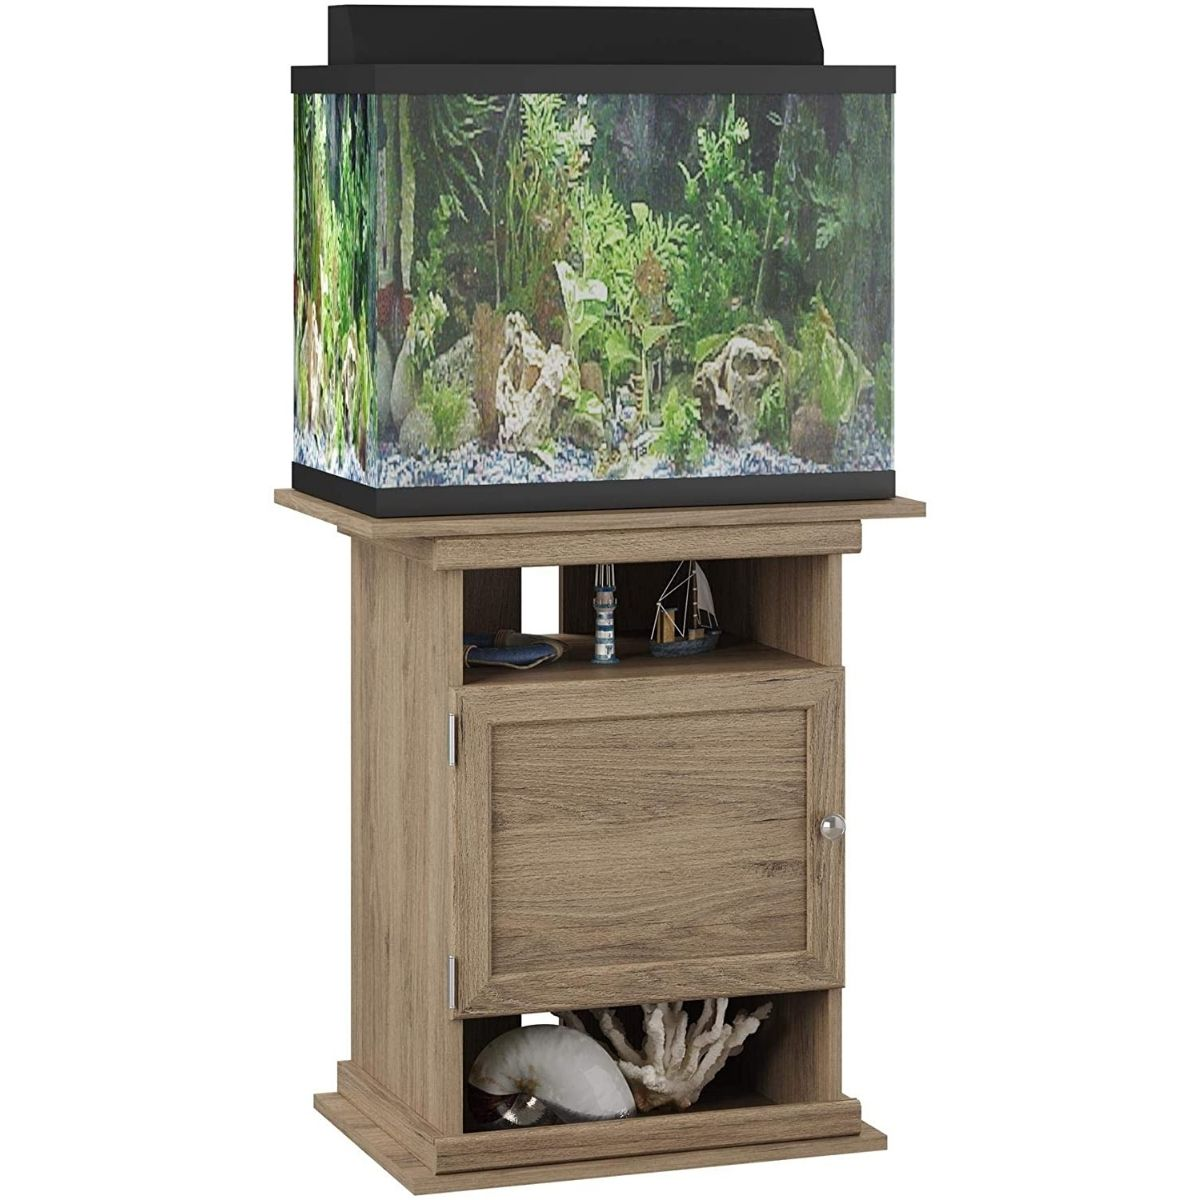 The Best 10 Gallon Fish Tank Stand Option: Flipper 10 Gallon Aquarium Stand